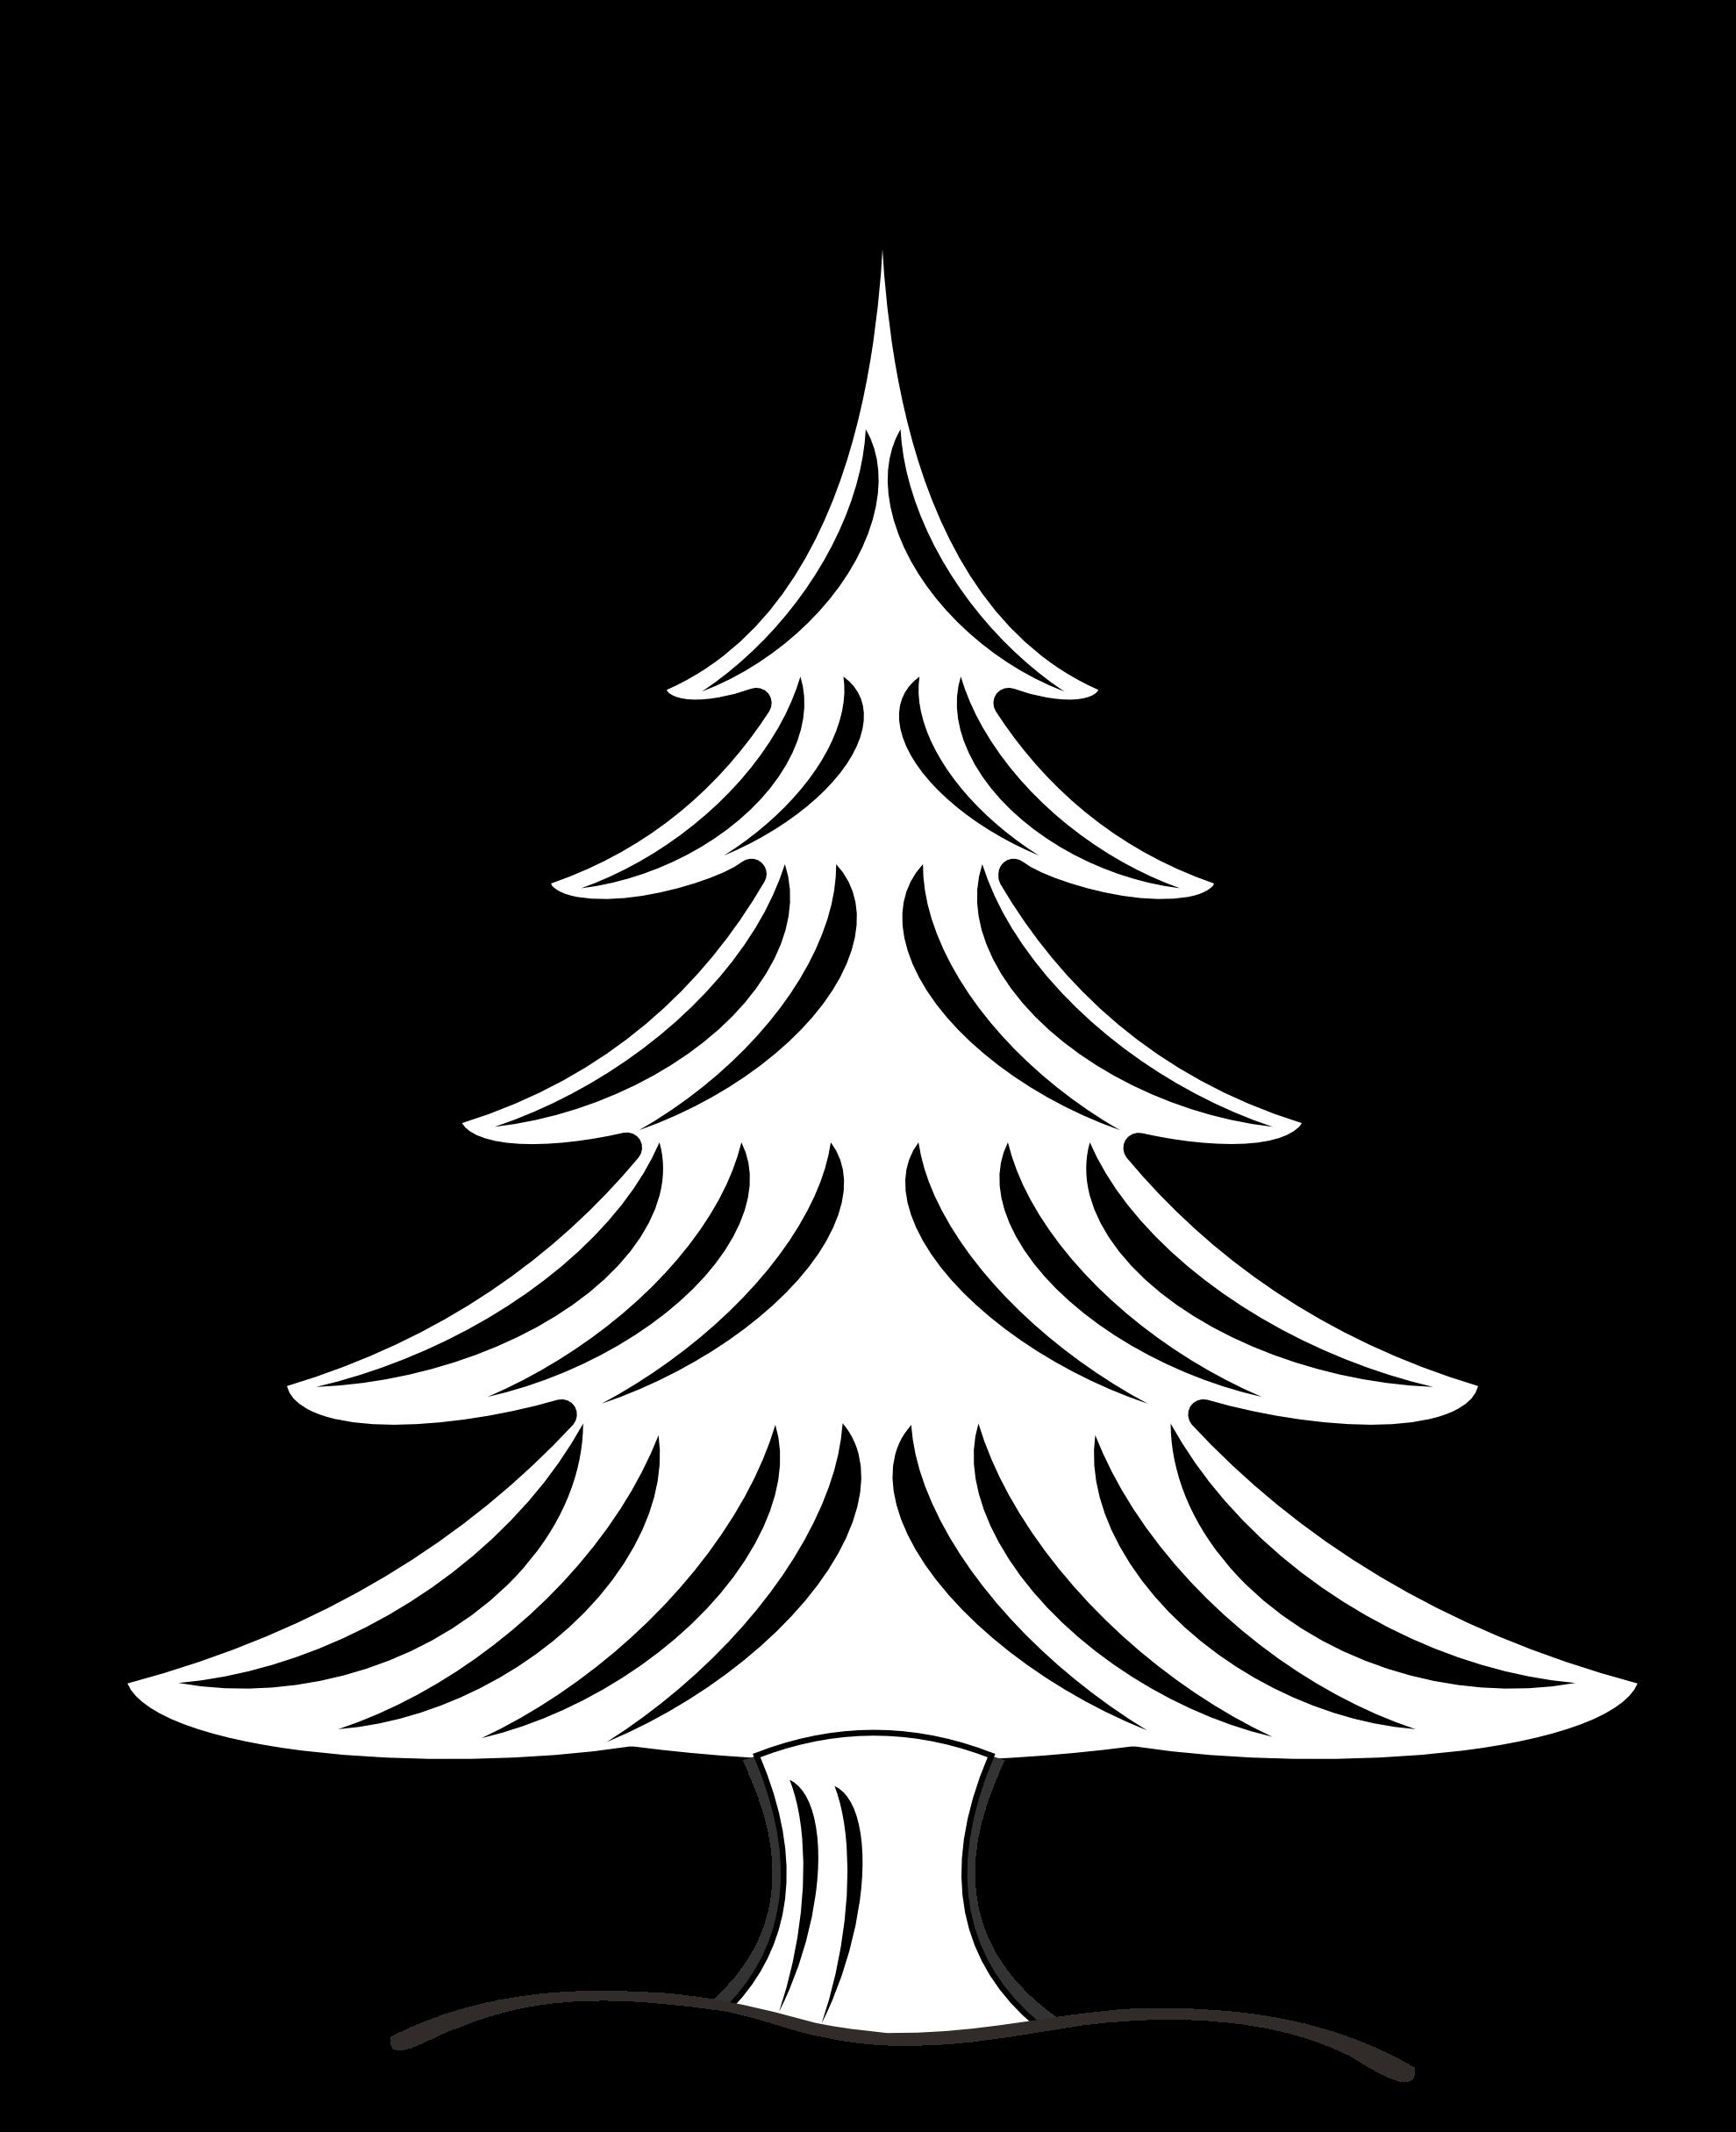 1979x2430 Drawn Fir Tree Logo 18 Draw Pine Coloring Pin 8 22f Ranch To A Diaiz